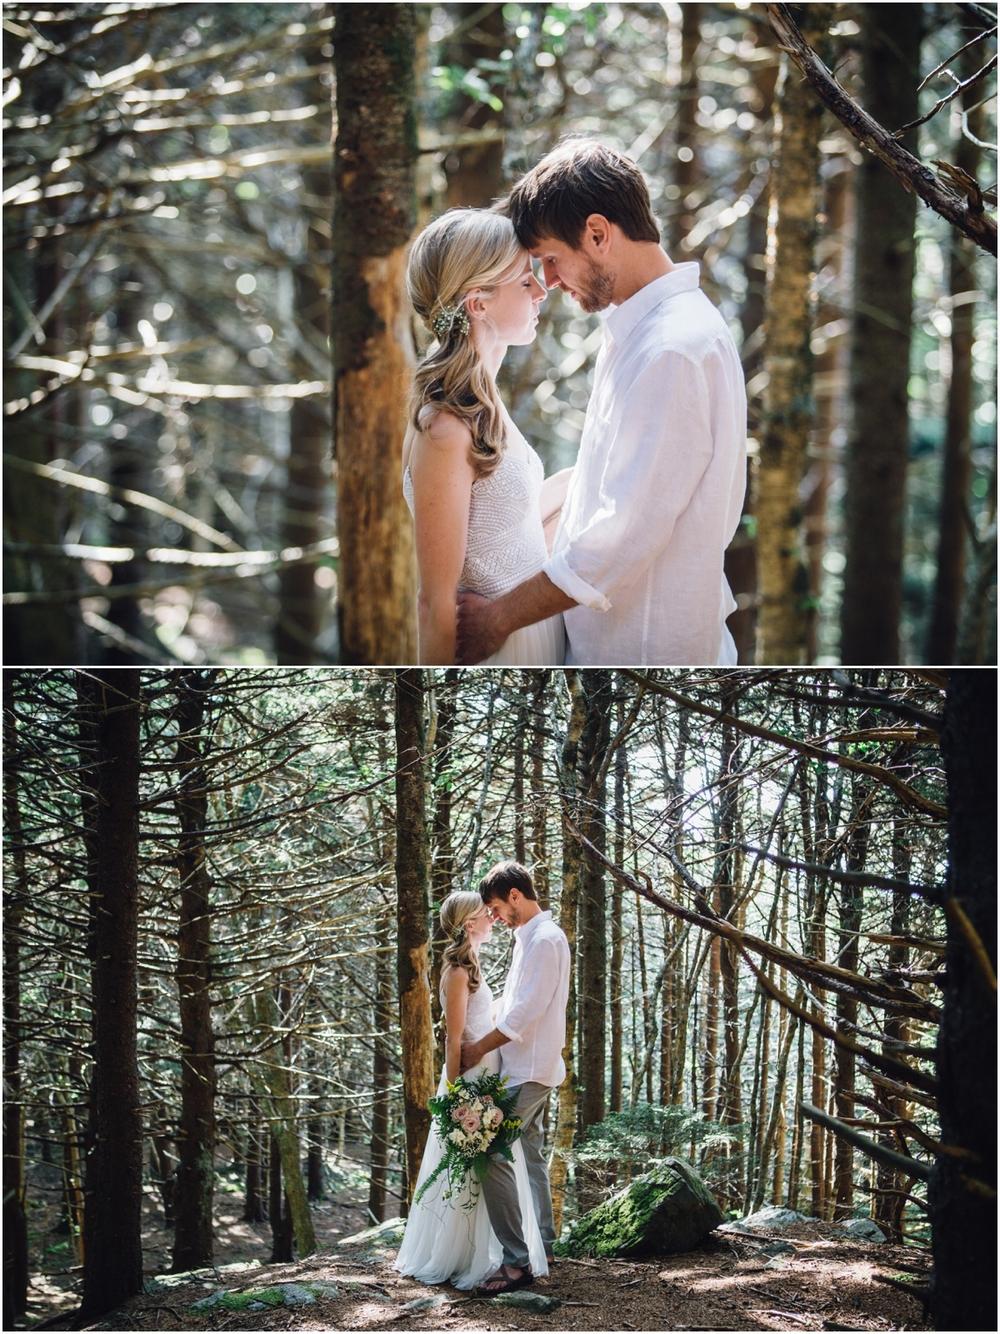 katy-sergent-photography-roan-mountain-elopement-wedding-north-carolina-tennessee-photographer_0007.jpg